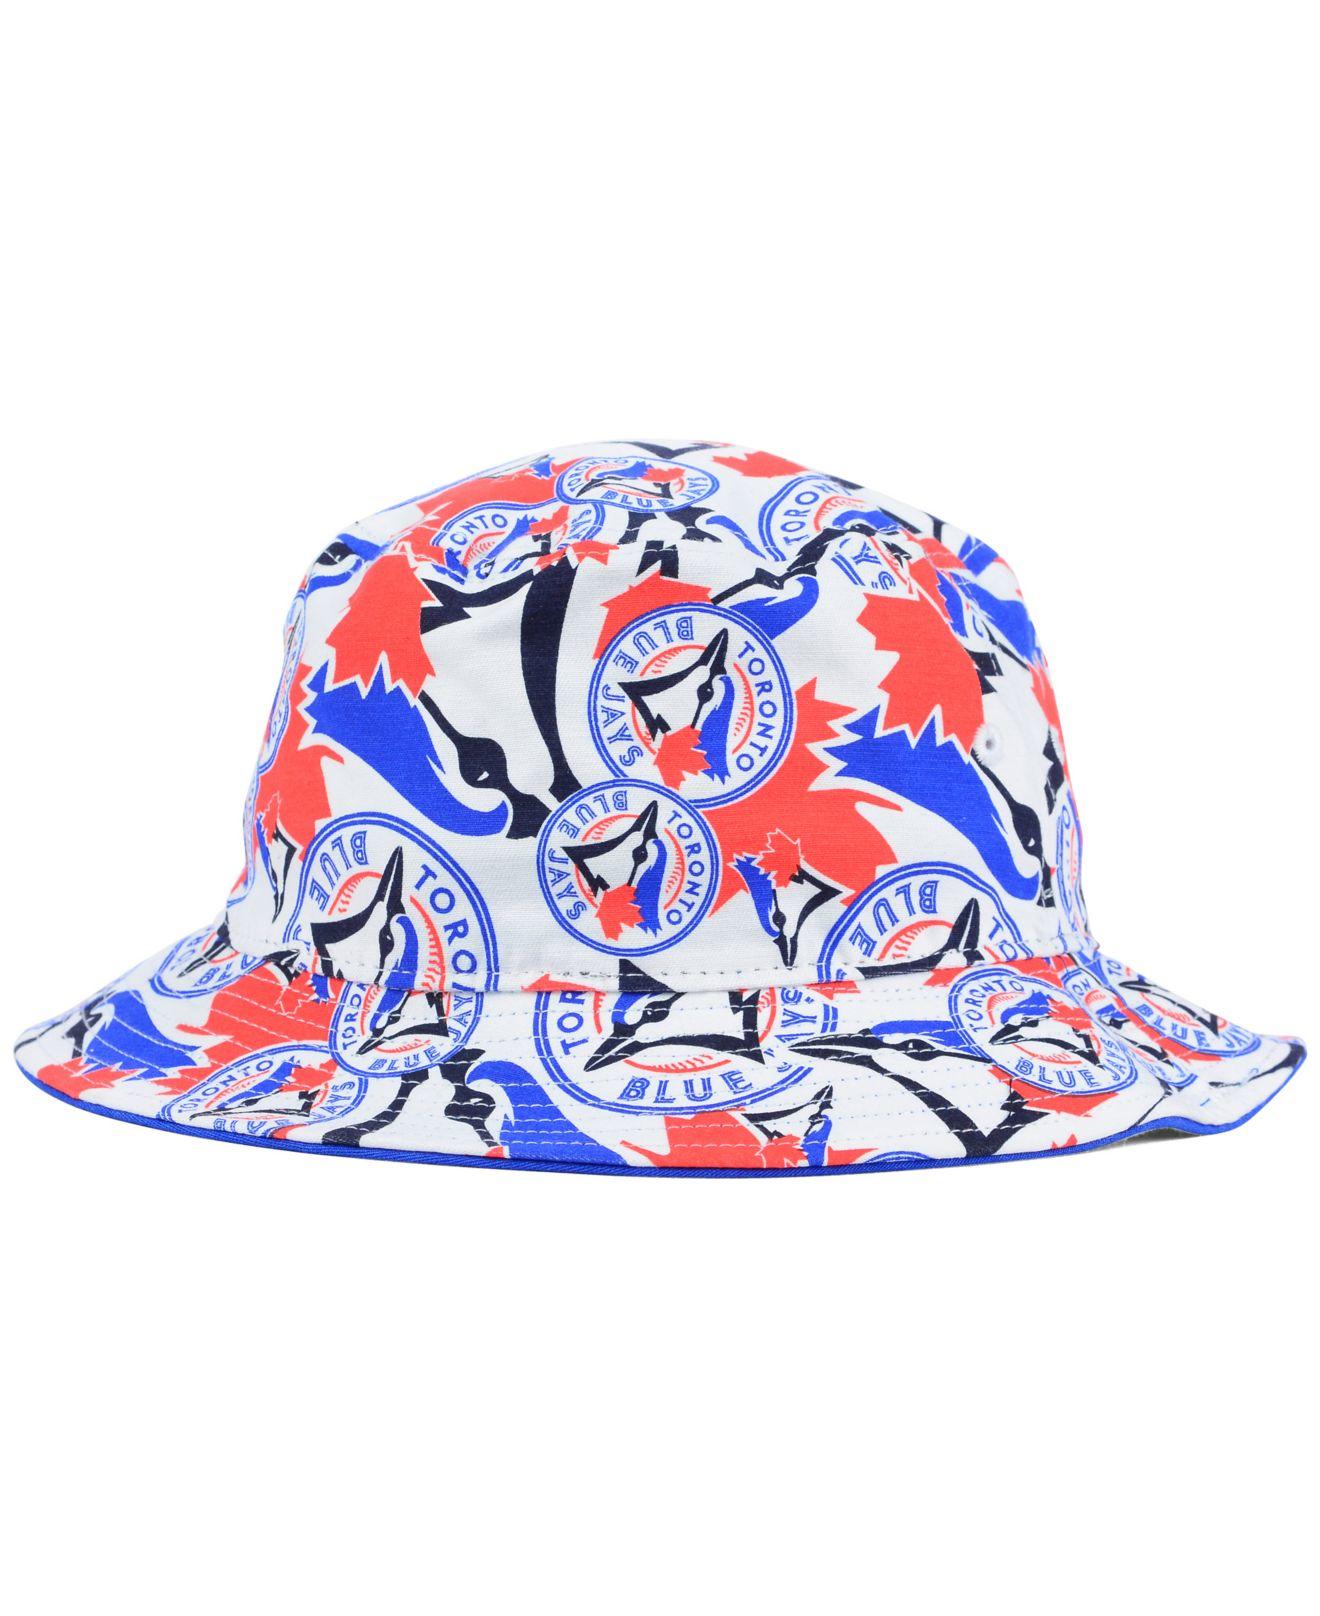 0f2c7a025 ... huge discount f64d7 4771d Lyst - 47 Brand Toronto Blue Jays Bravado  Bucket Hat in Whit ...